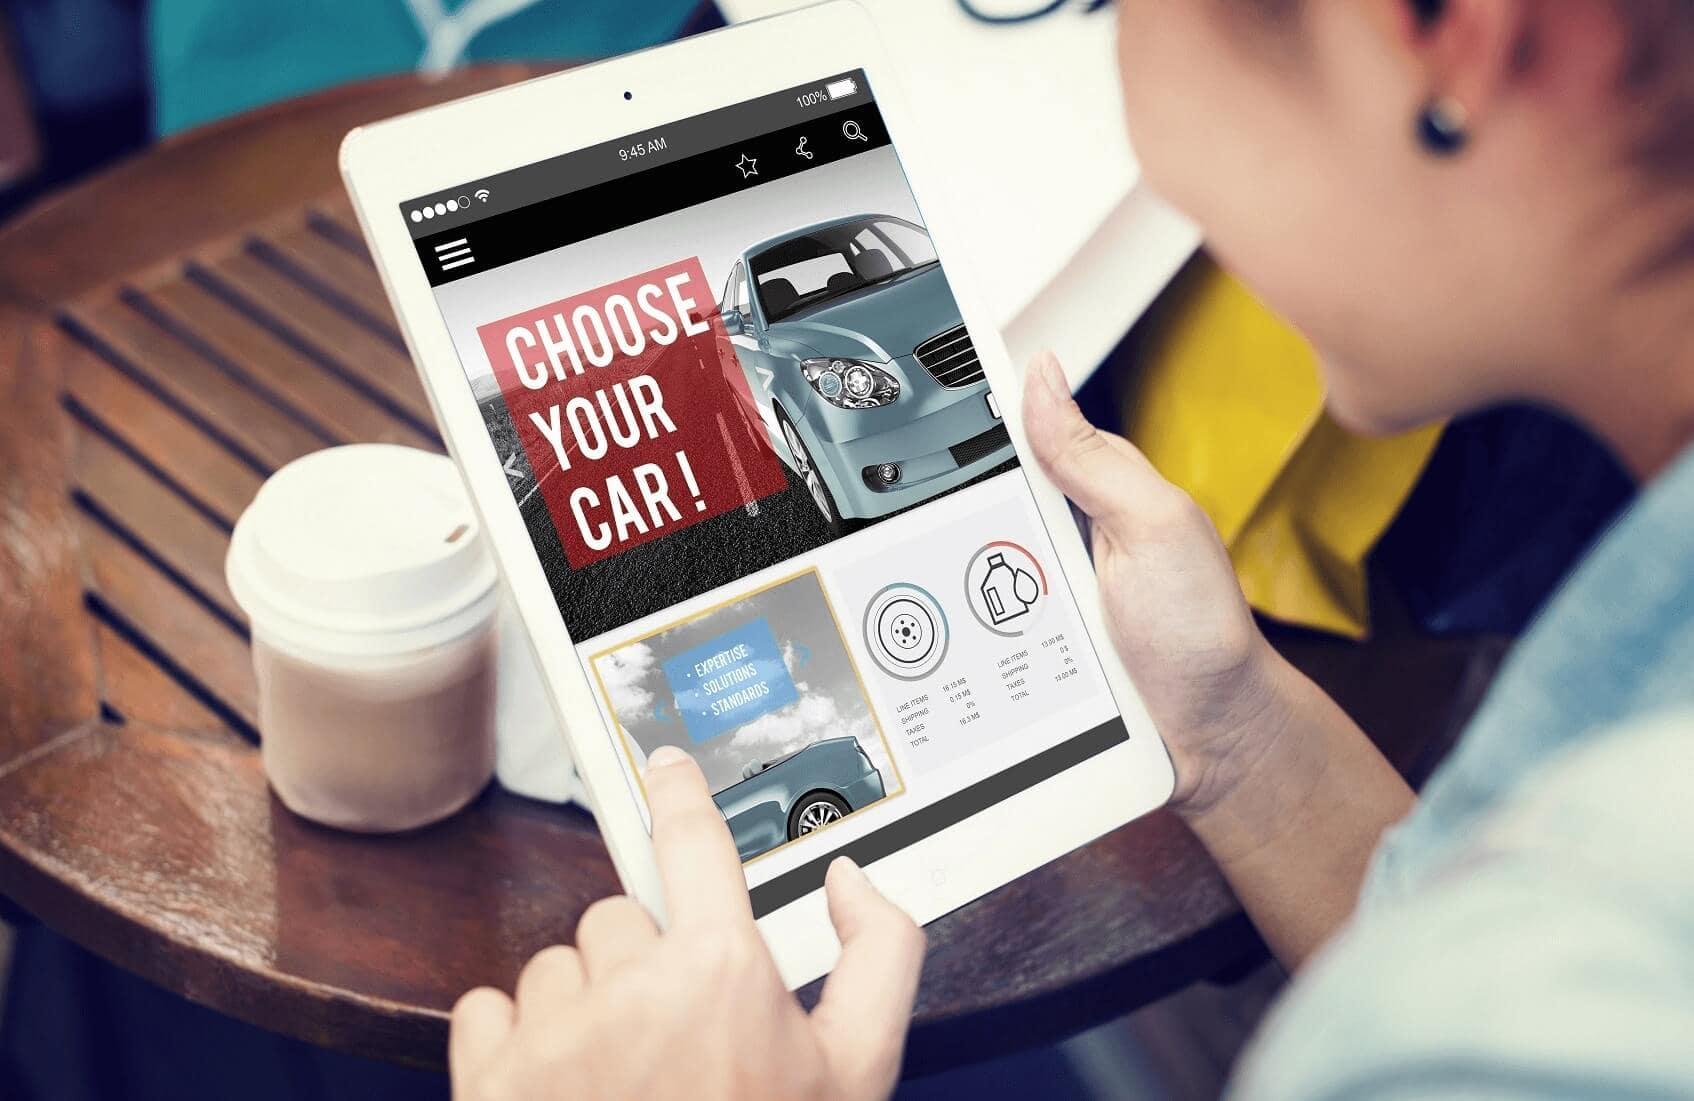 Choosing a Car Online